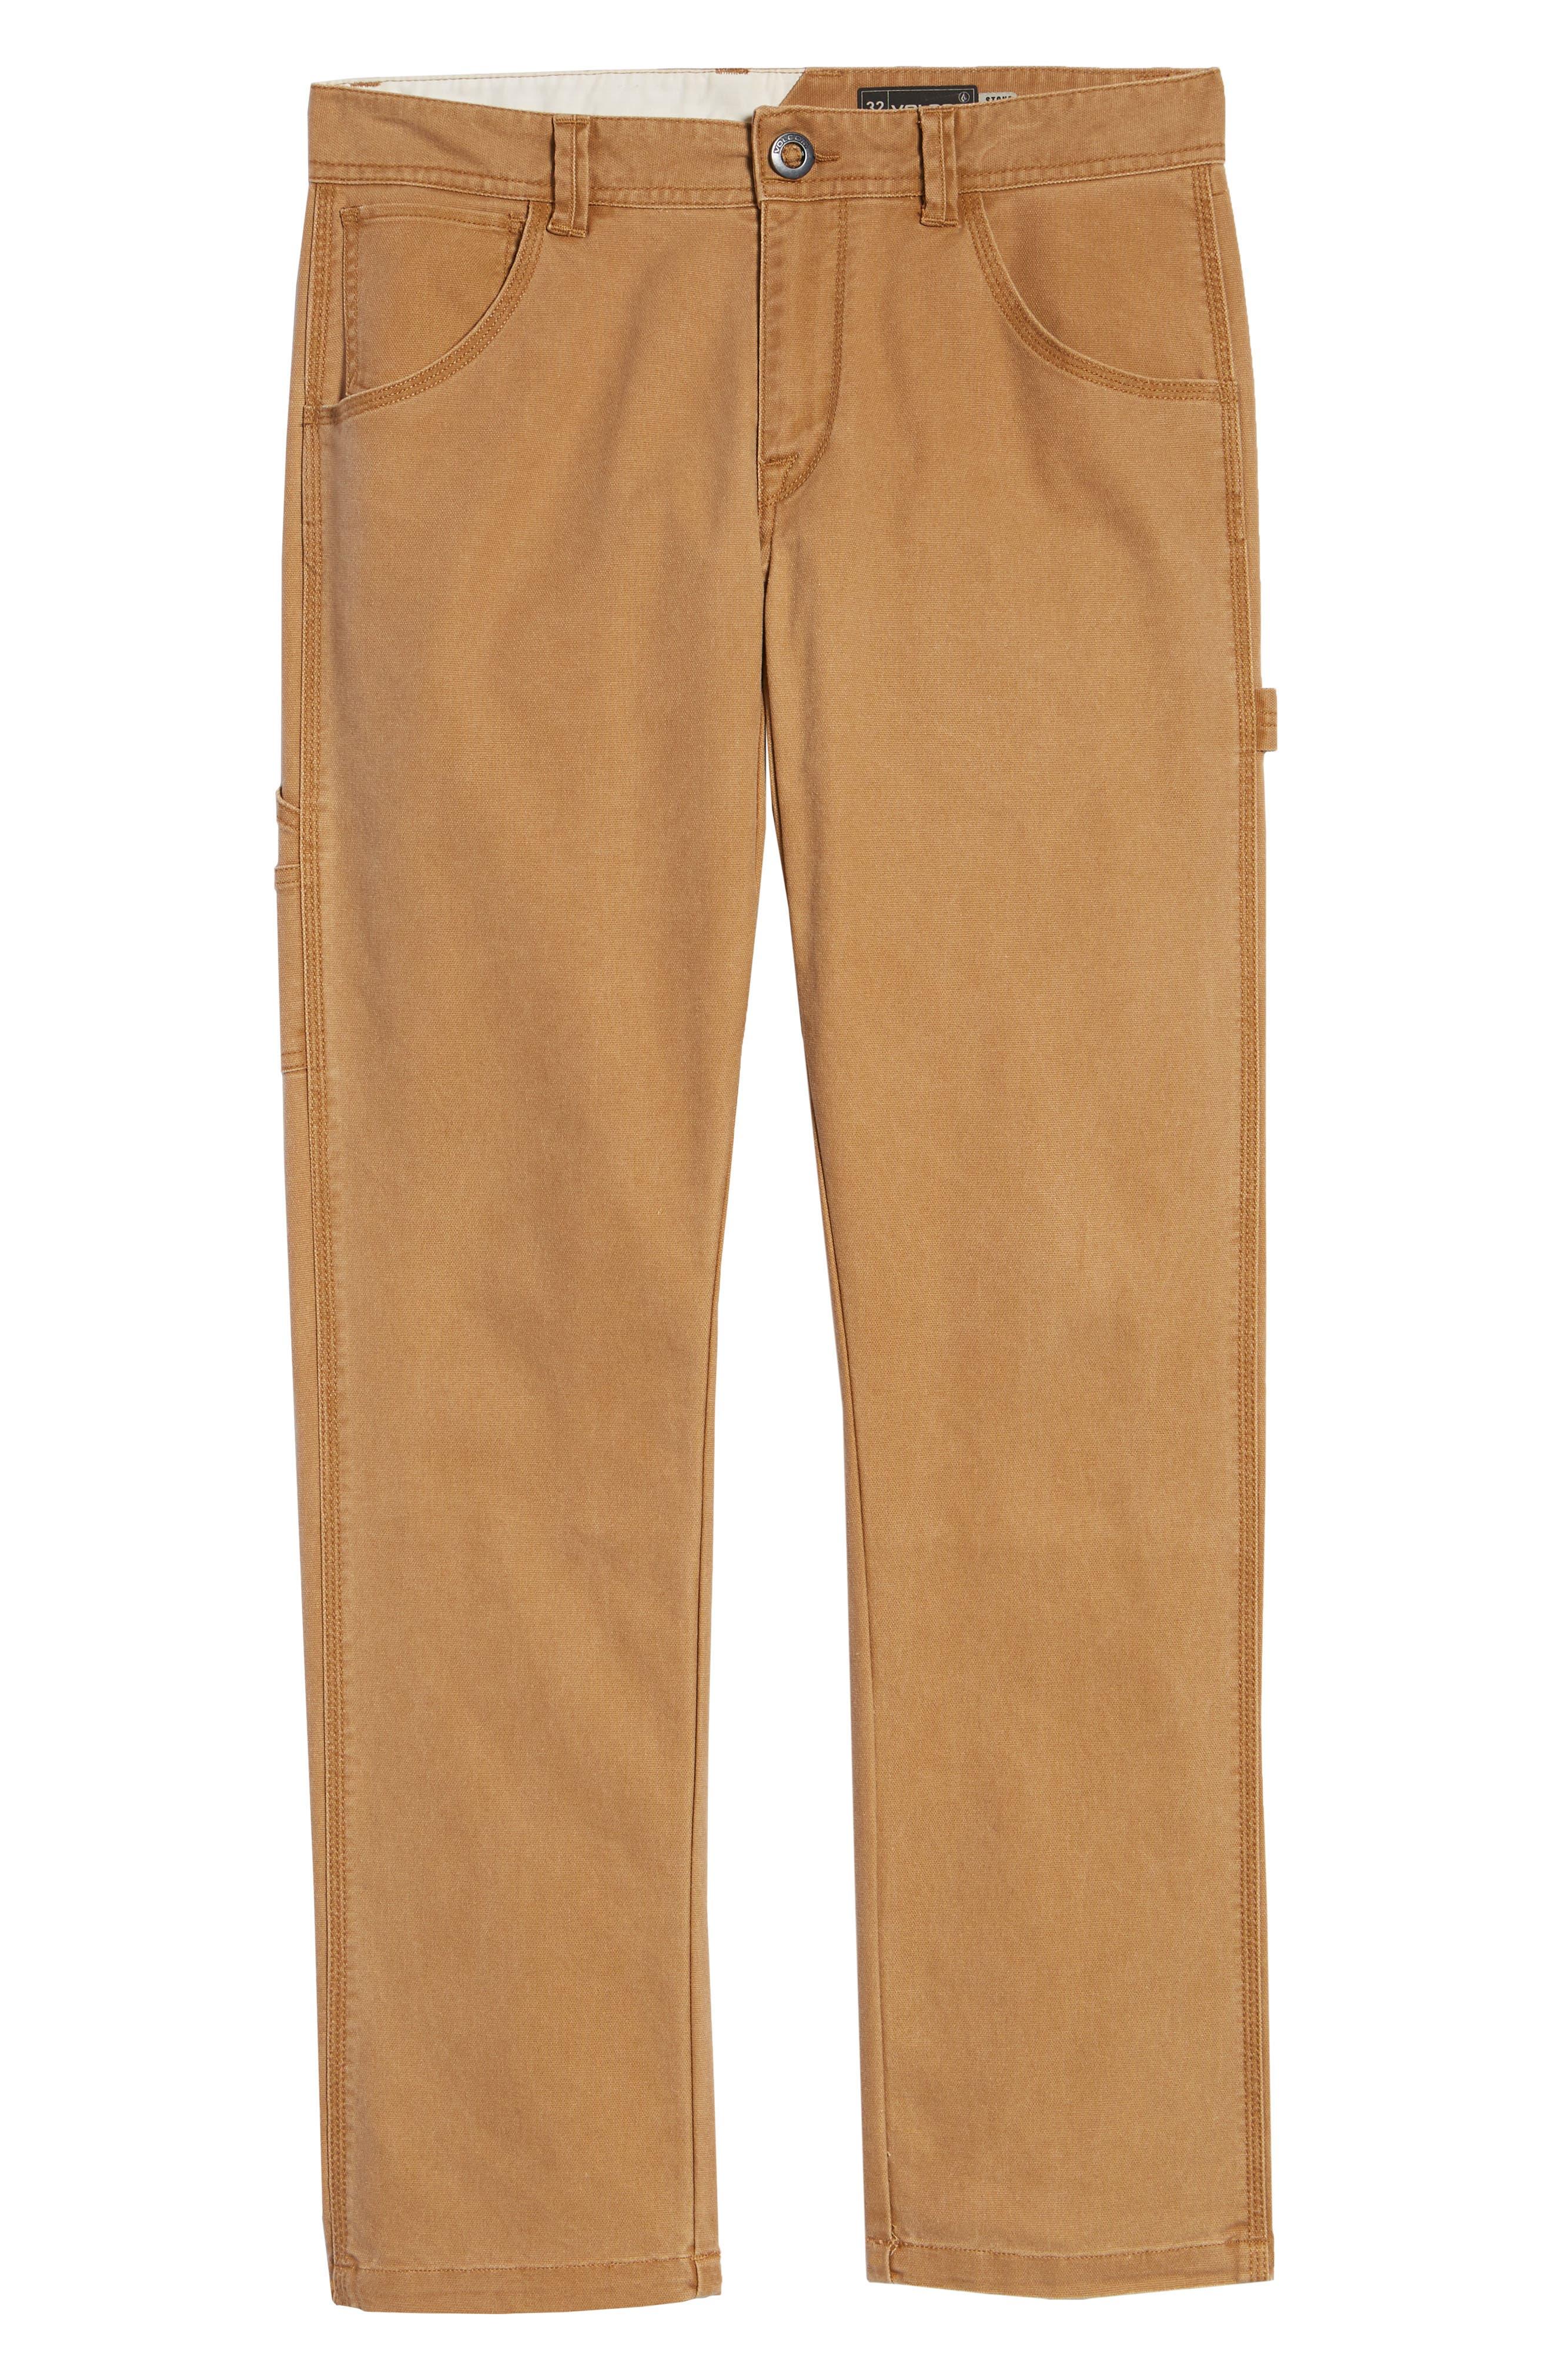 VSM Whaler Pants,                             Alternate thumbnail 6, color,                             CAMEL